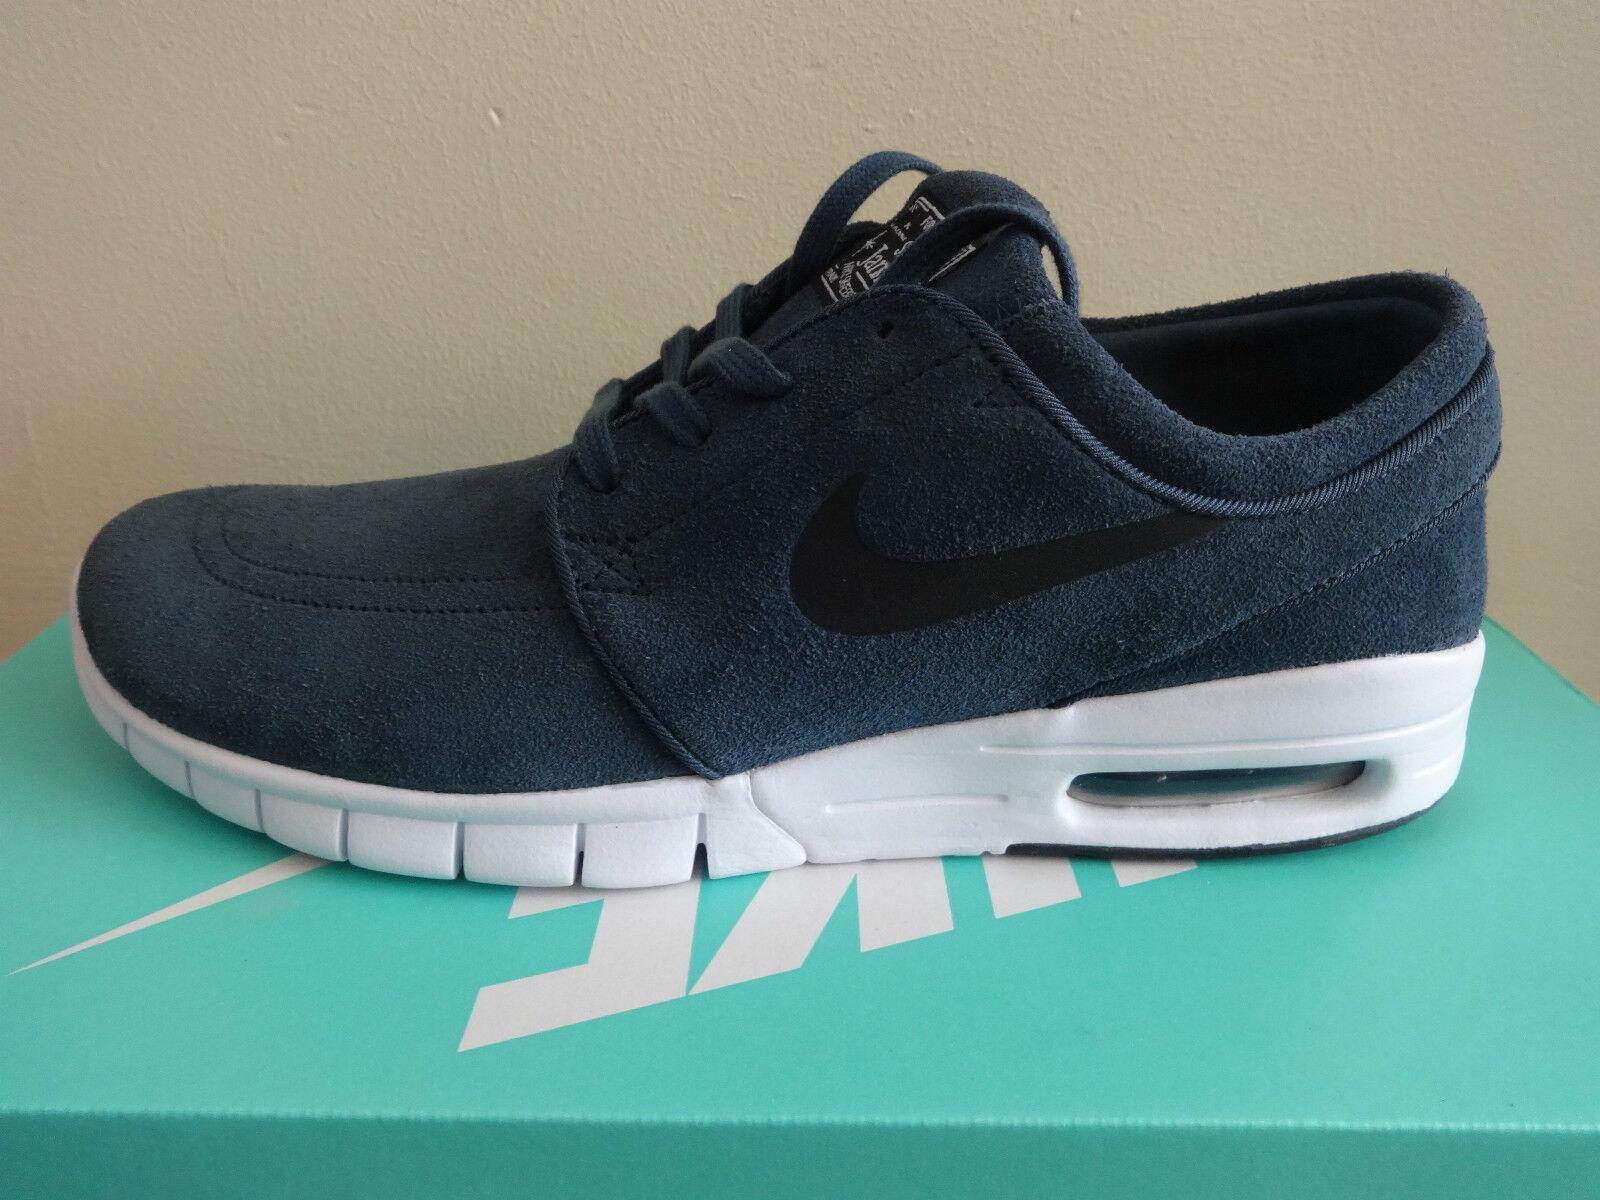 Nike Stefan Janoski Max mens L skate shoes 685299 402 trainers SB squadron blue